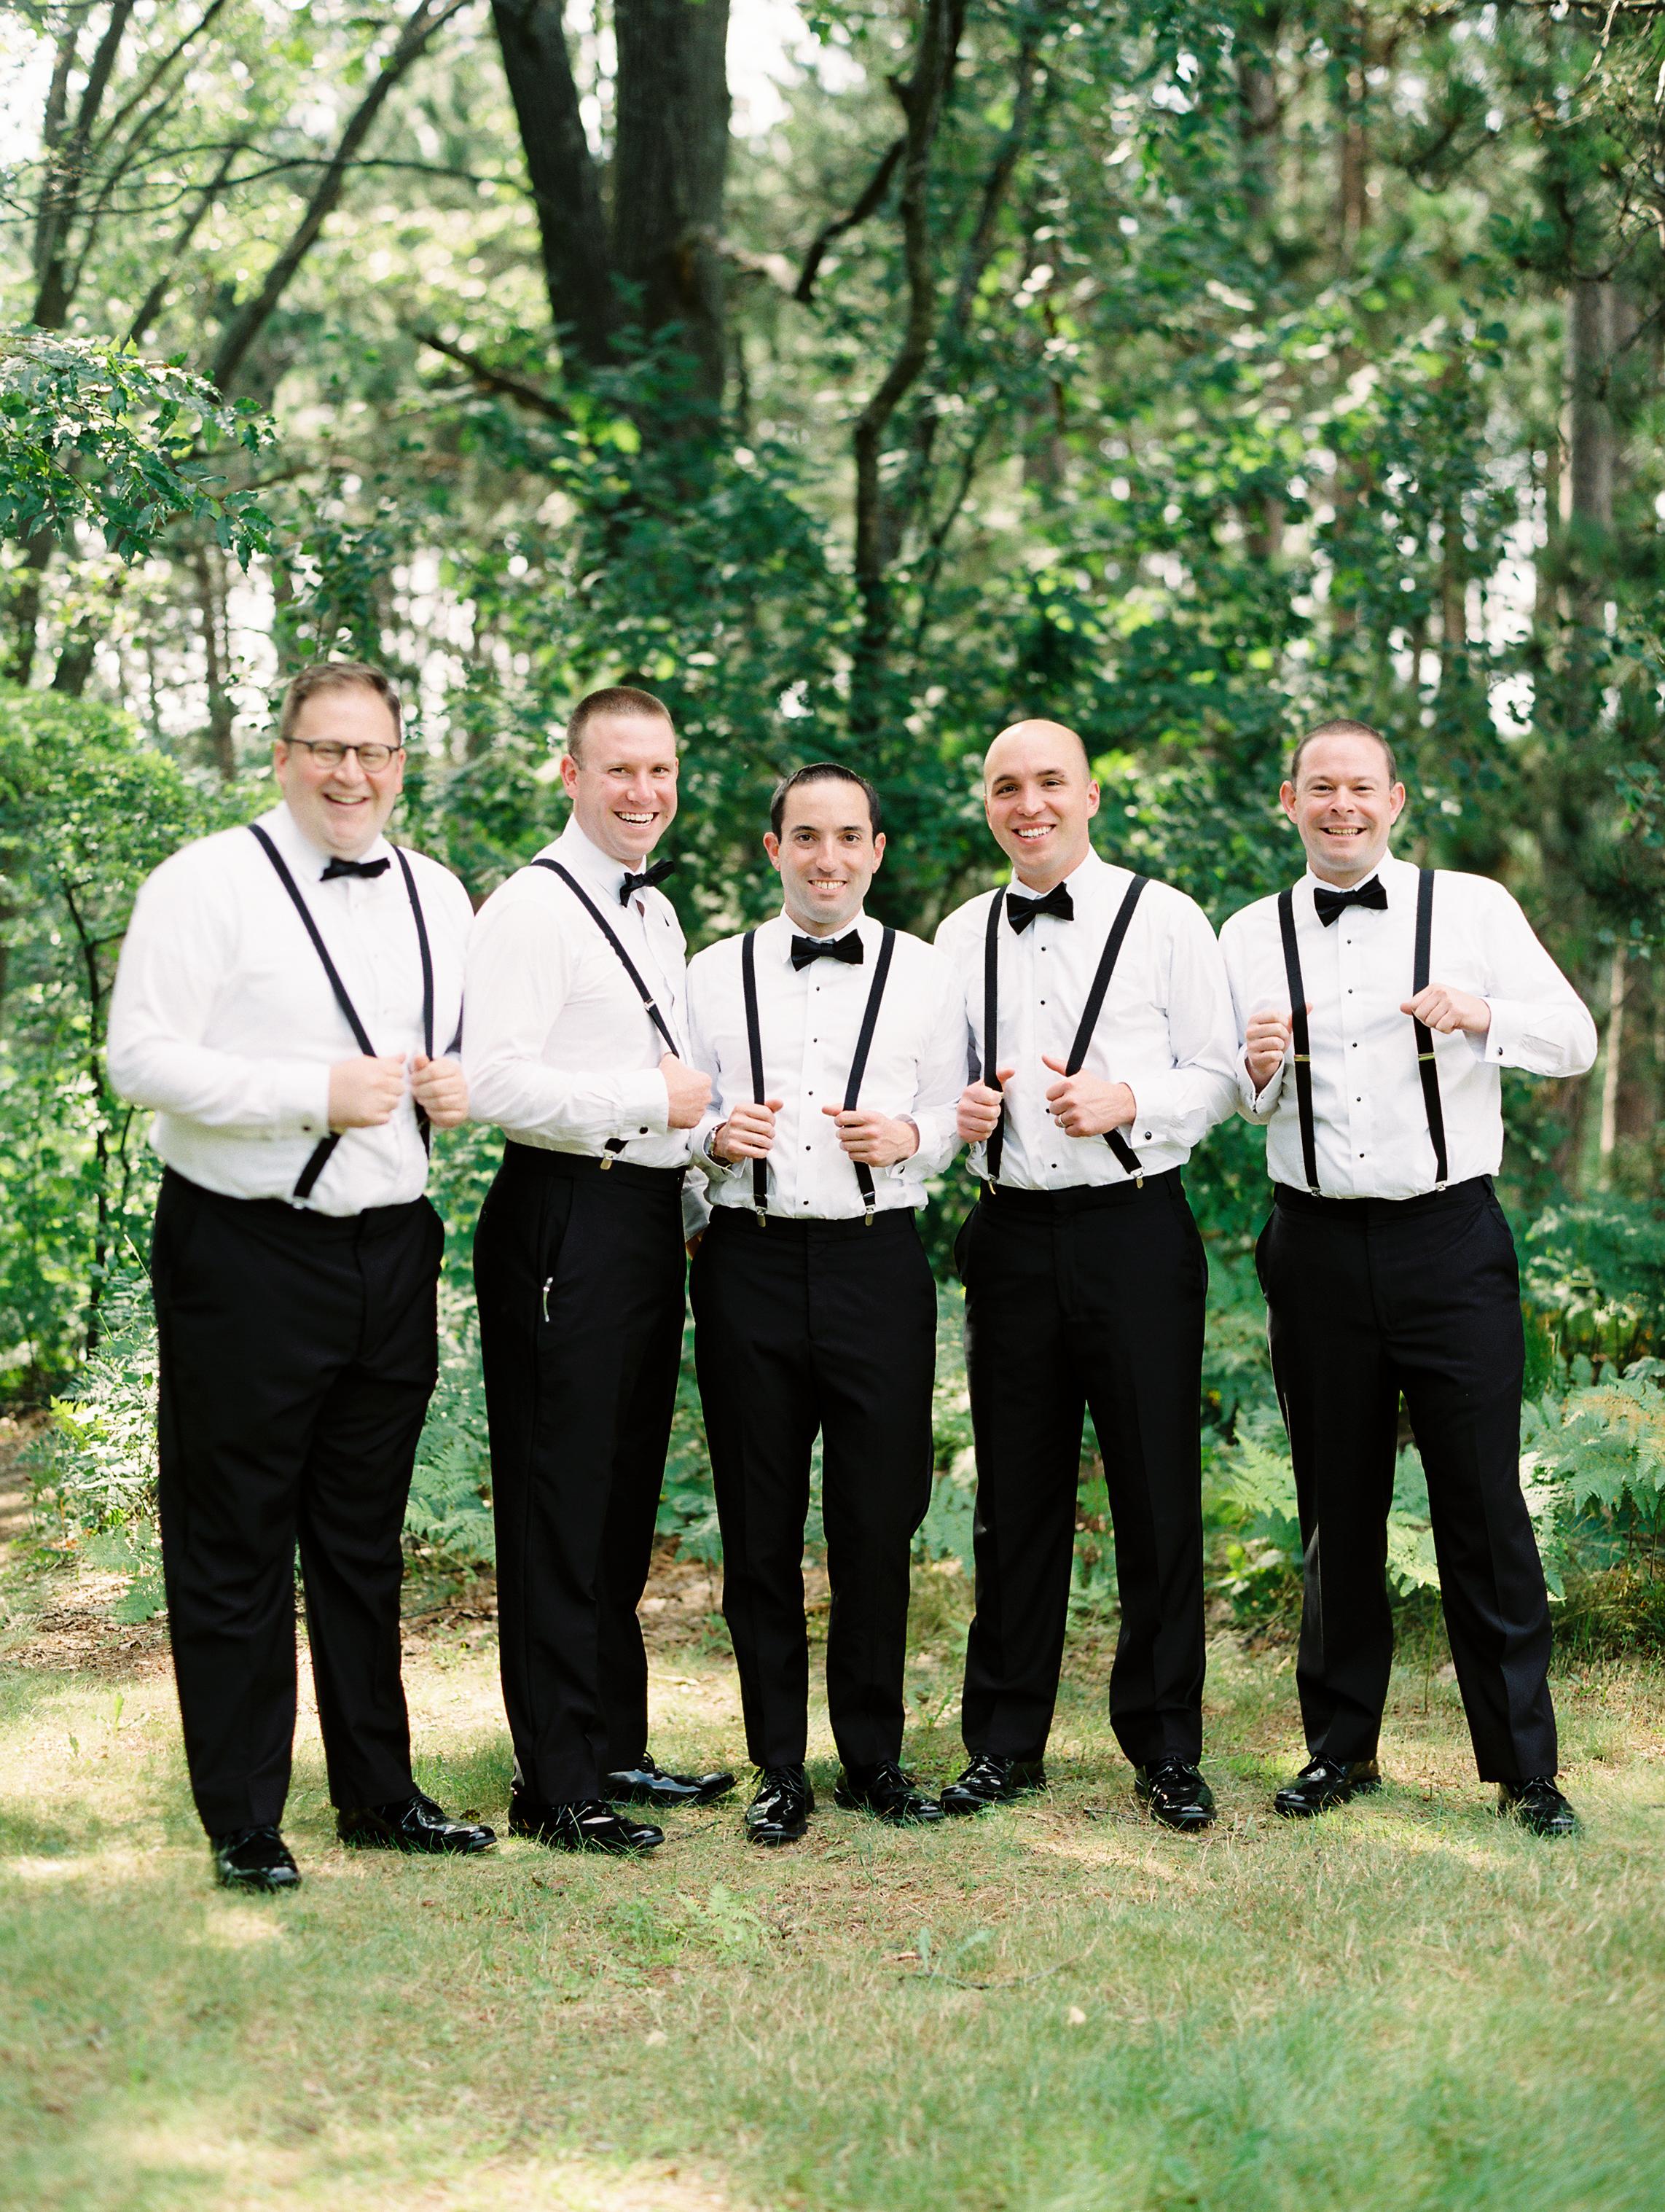 Zoller+Wedding+Bridal+Partyf-62.jpg